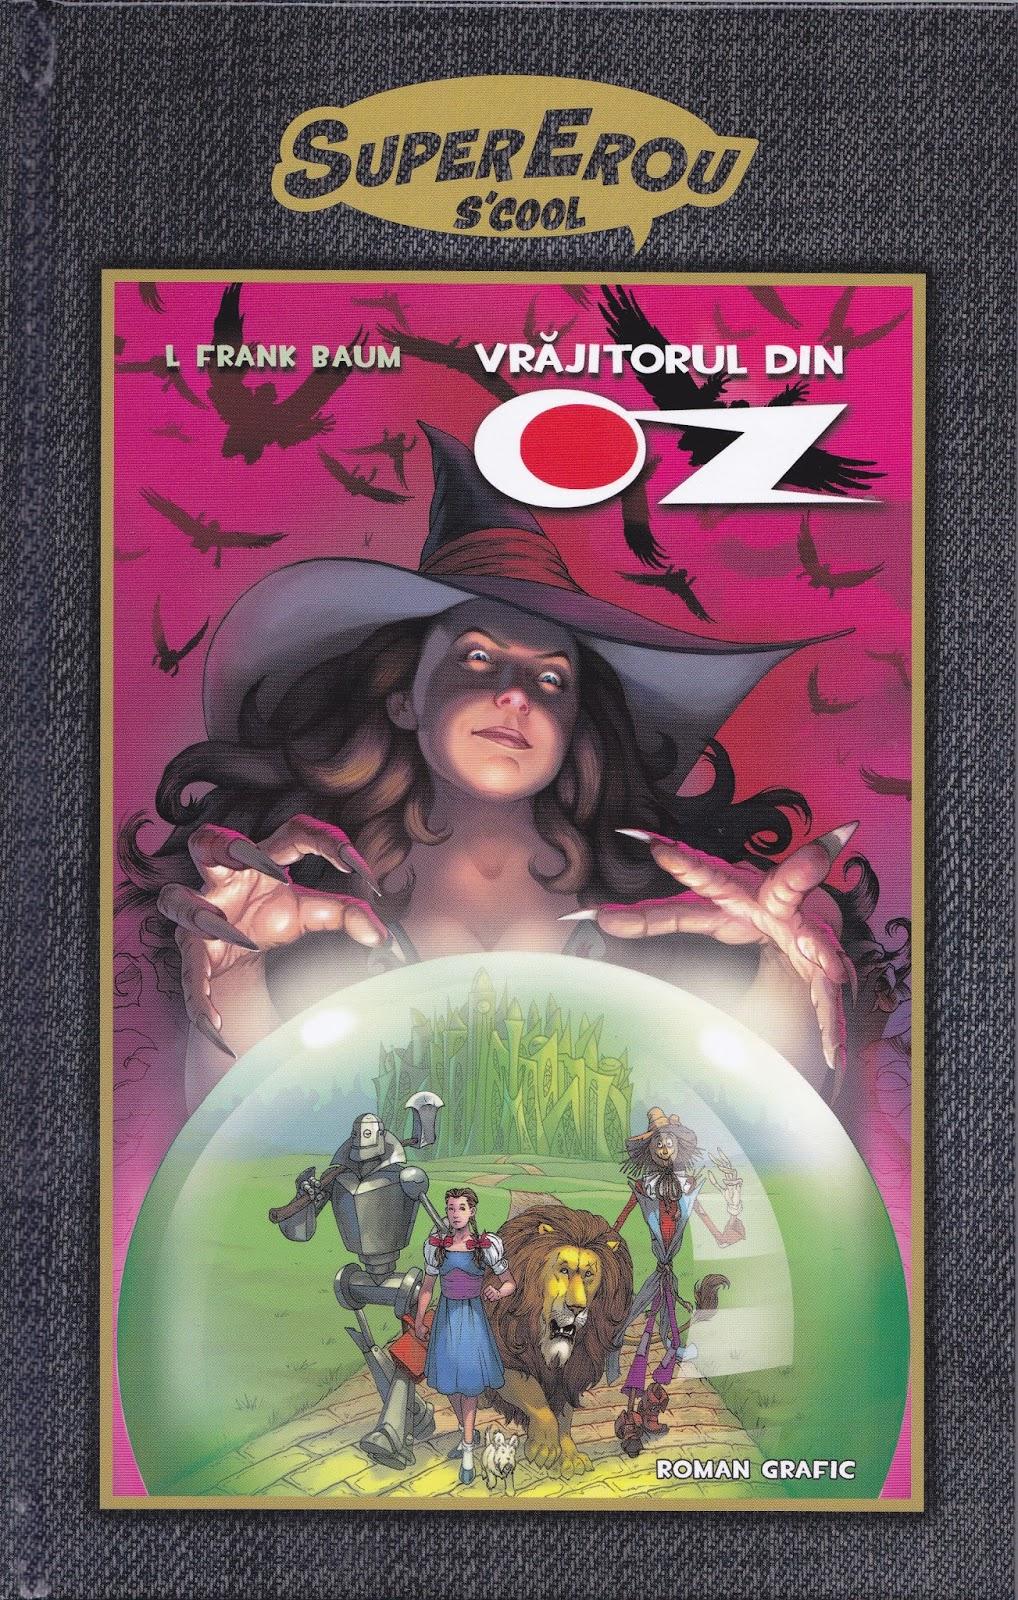 Benzi Desenate Supererou Scool Vrăjitorul Din Oz